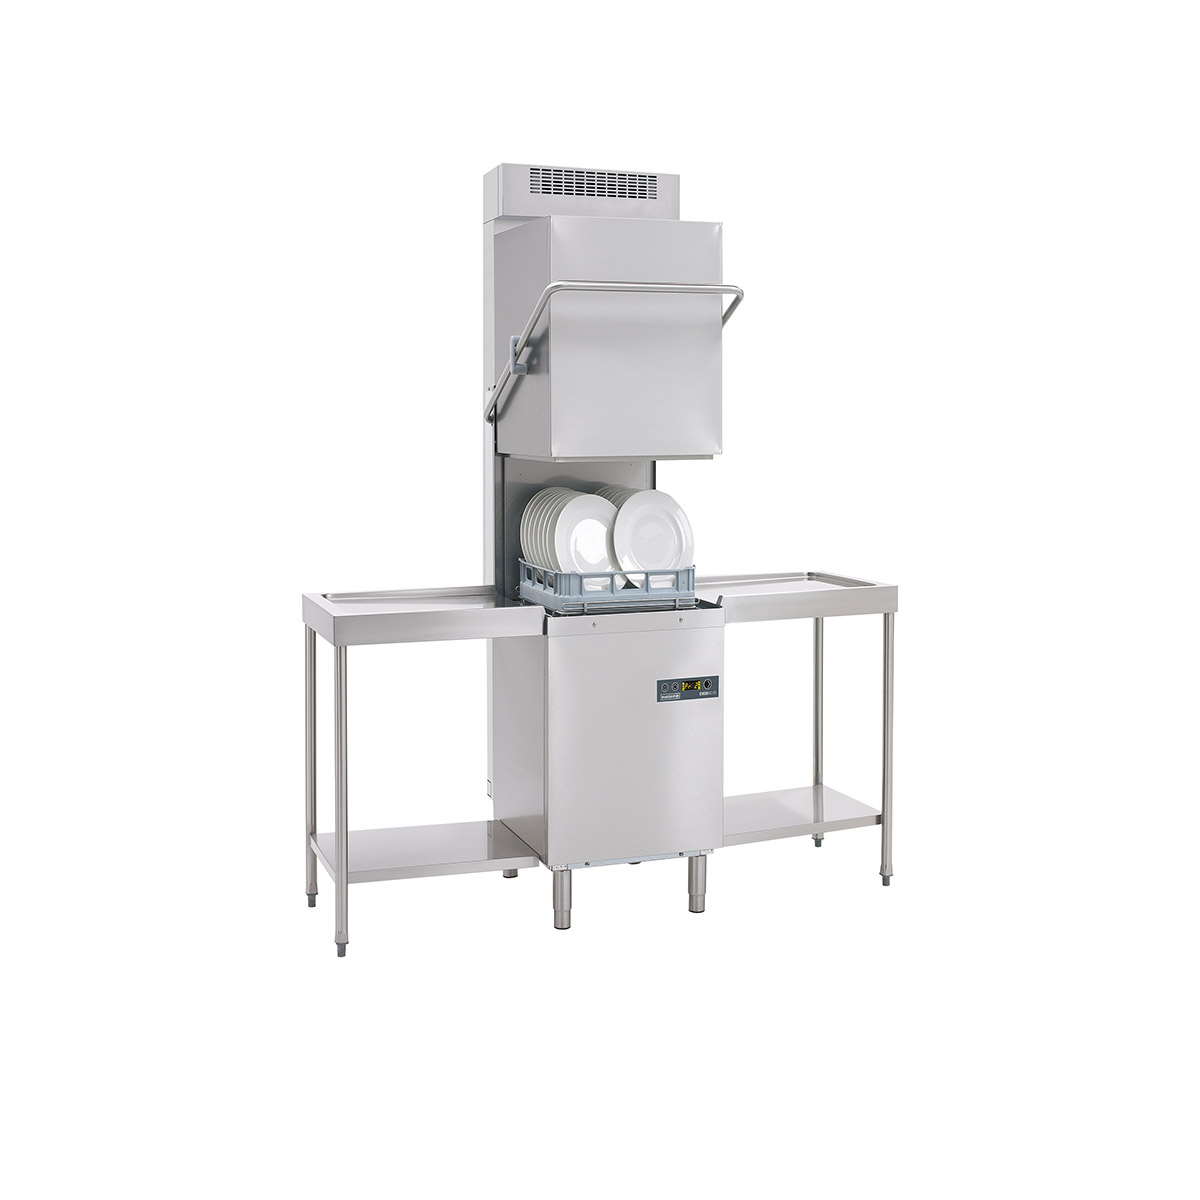 Maidaid Halcyon Passthrough Dishwasher C1035WSHR